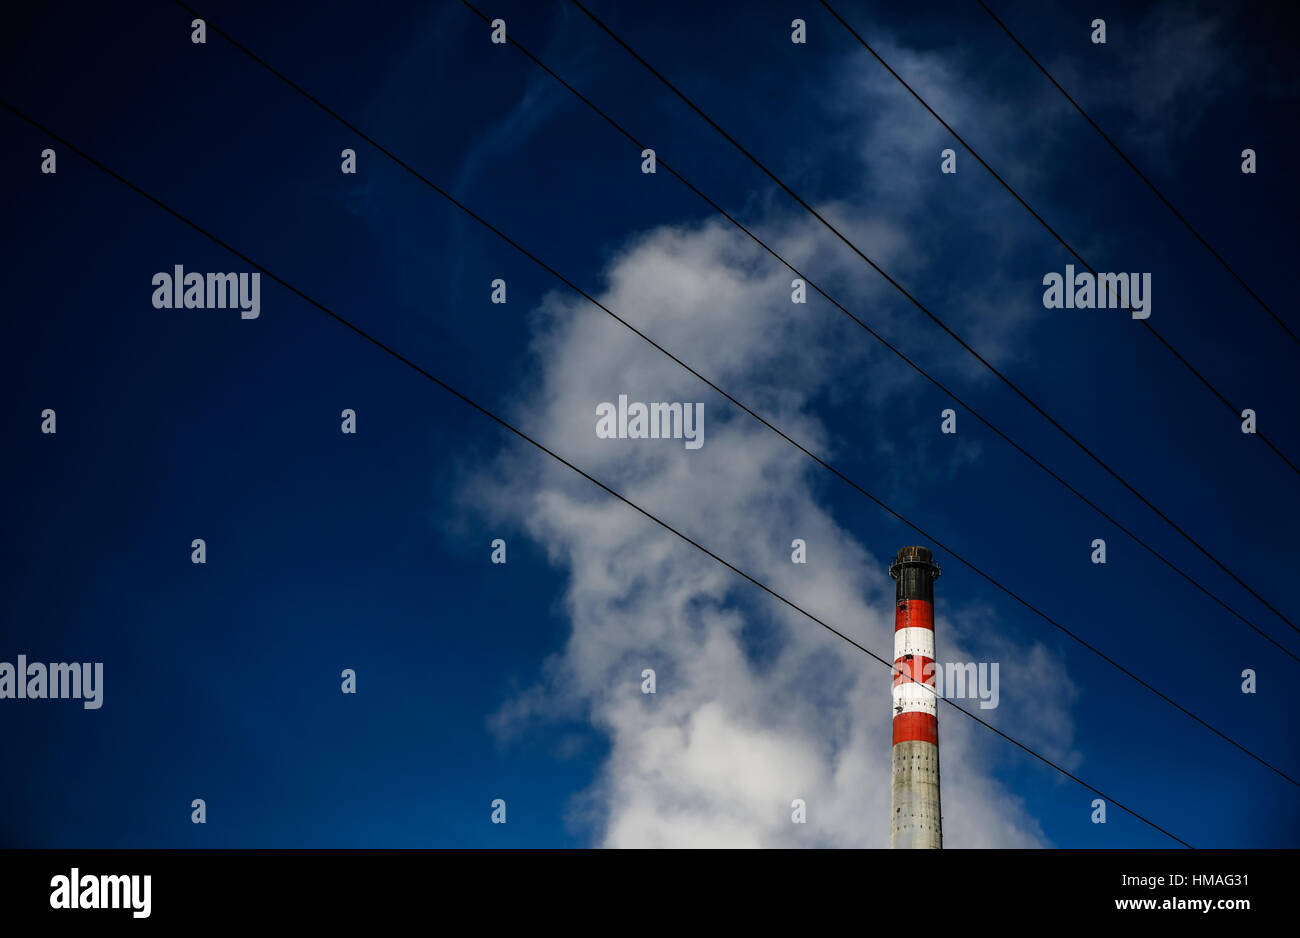 Chimenea de la planta de energía térmica Imagen De Stock